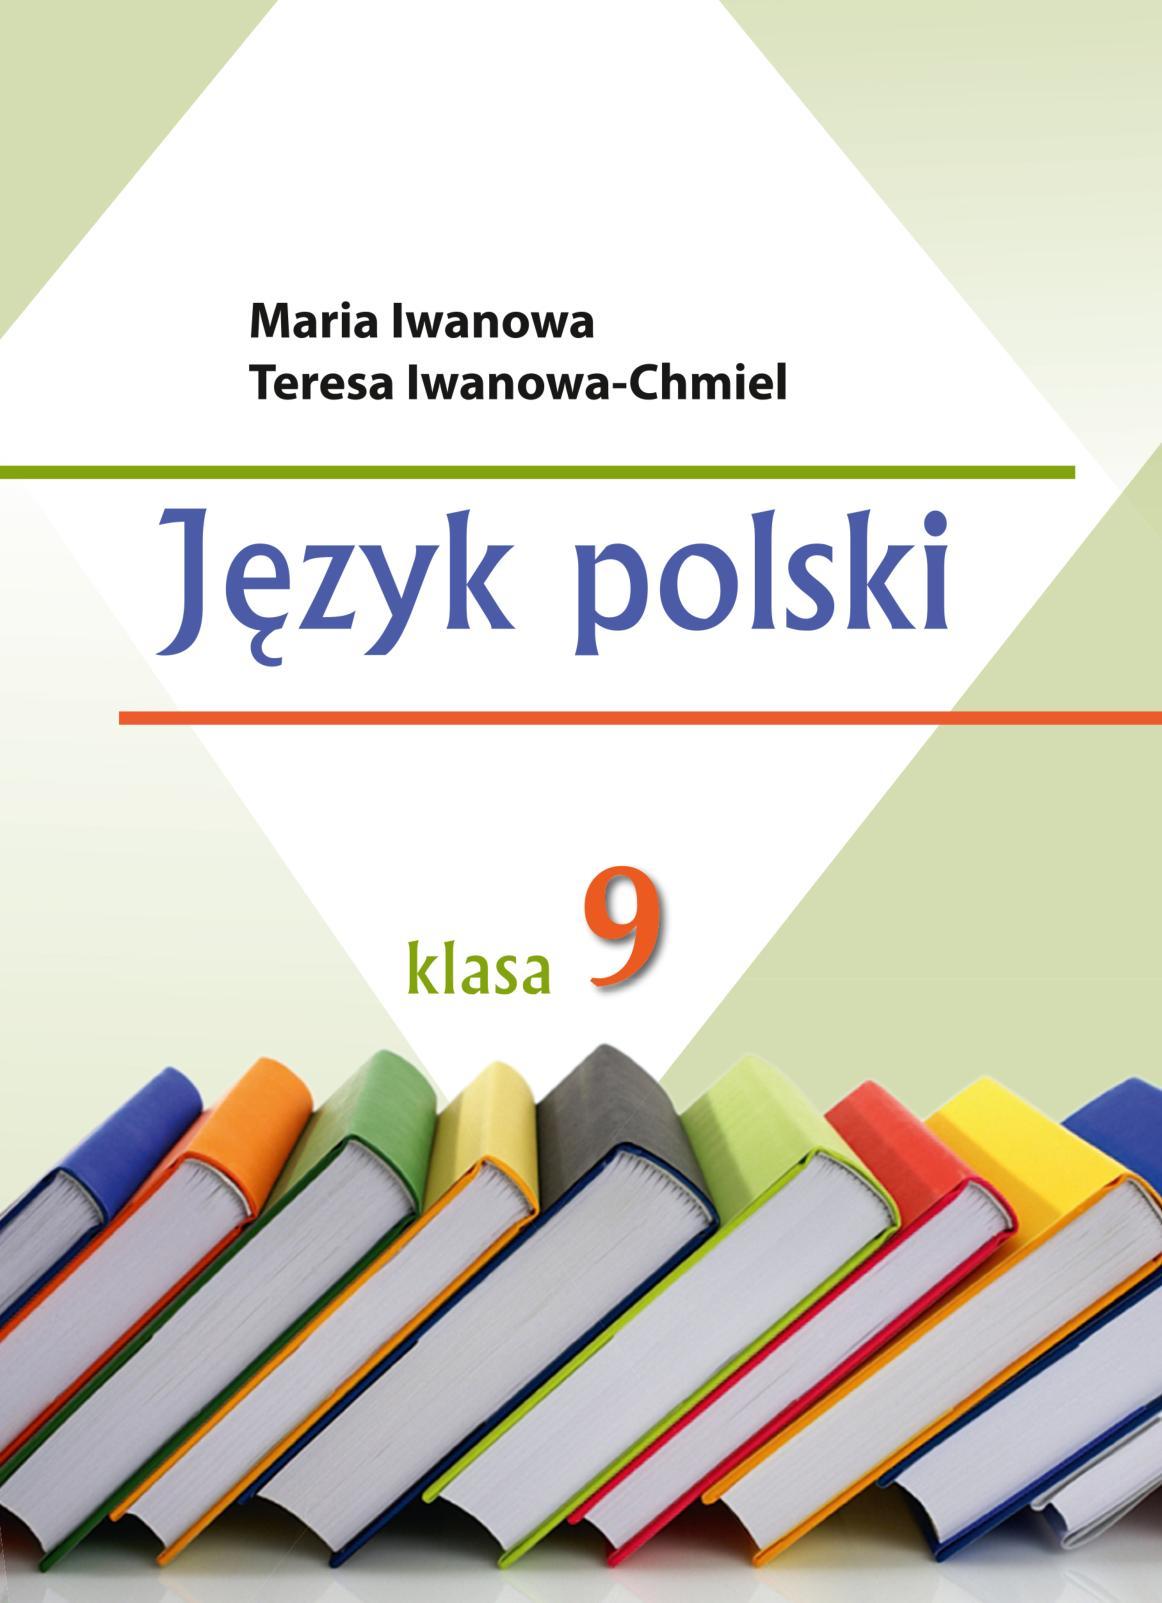 Calaméo 9 Klas Polska Mova Ivanova 2017